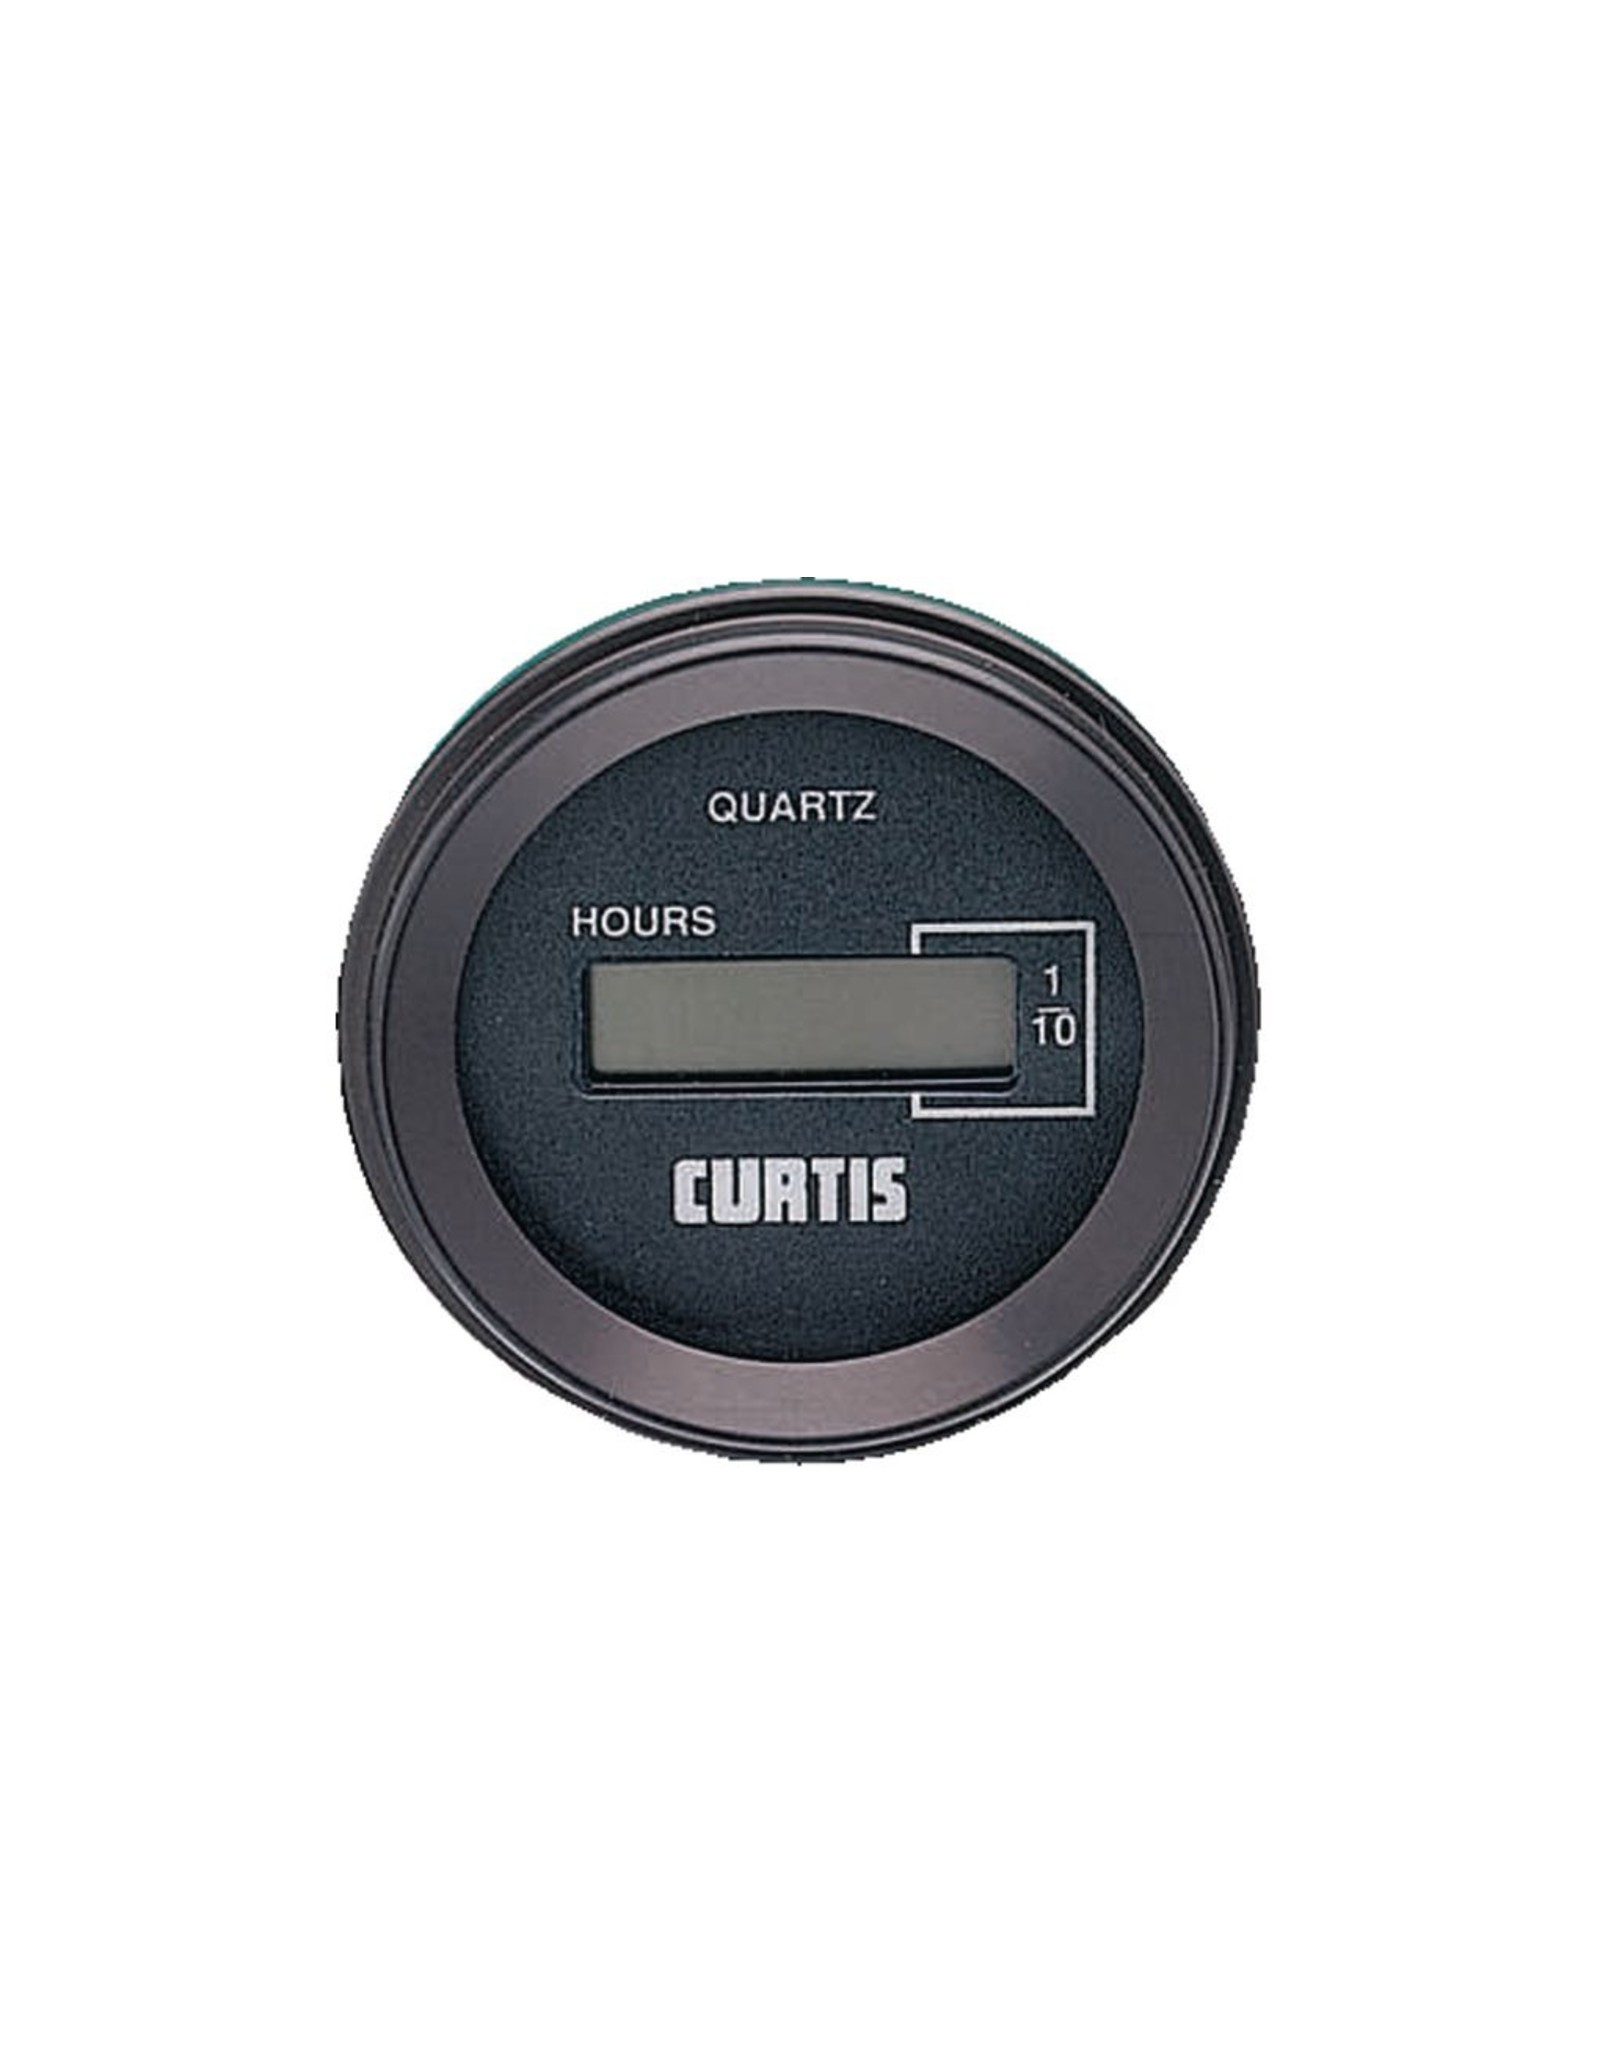 Osculati Curtis uur meter